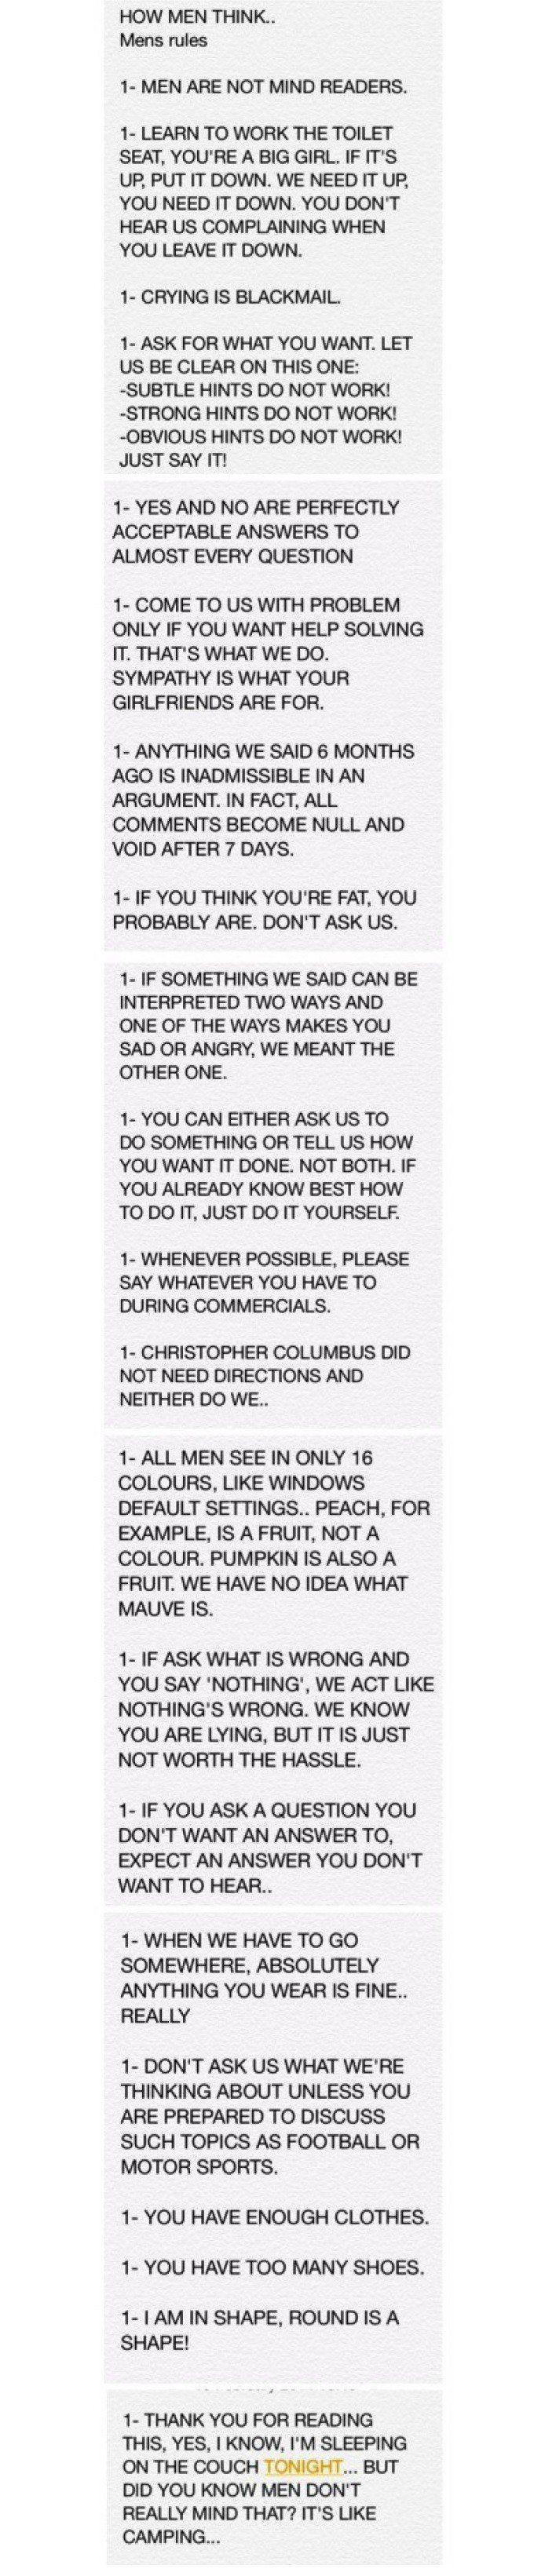 21 rules men have